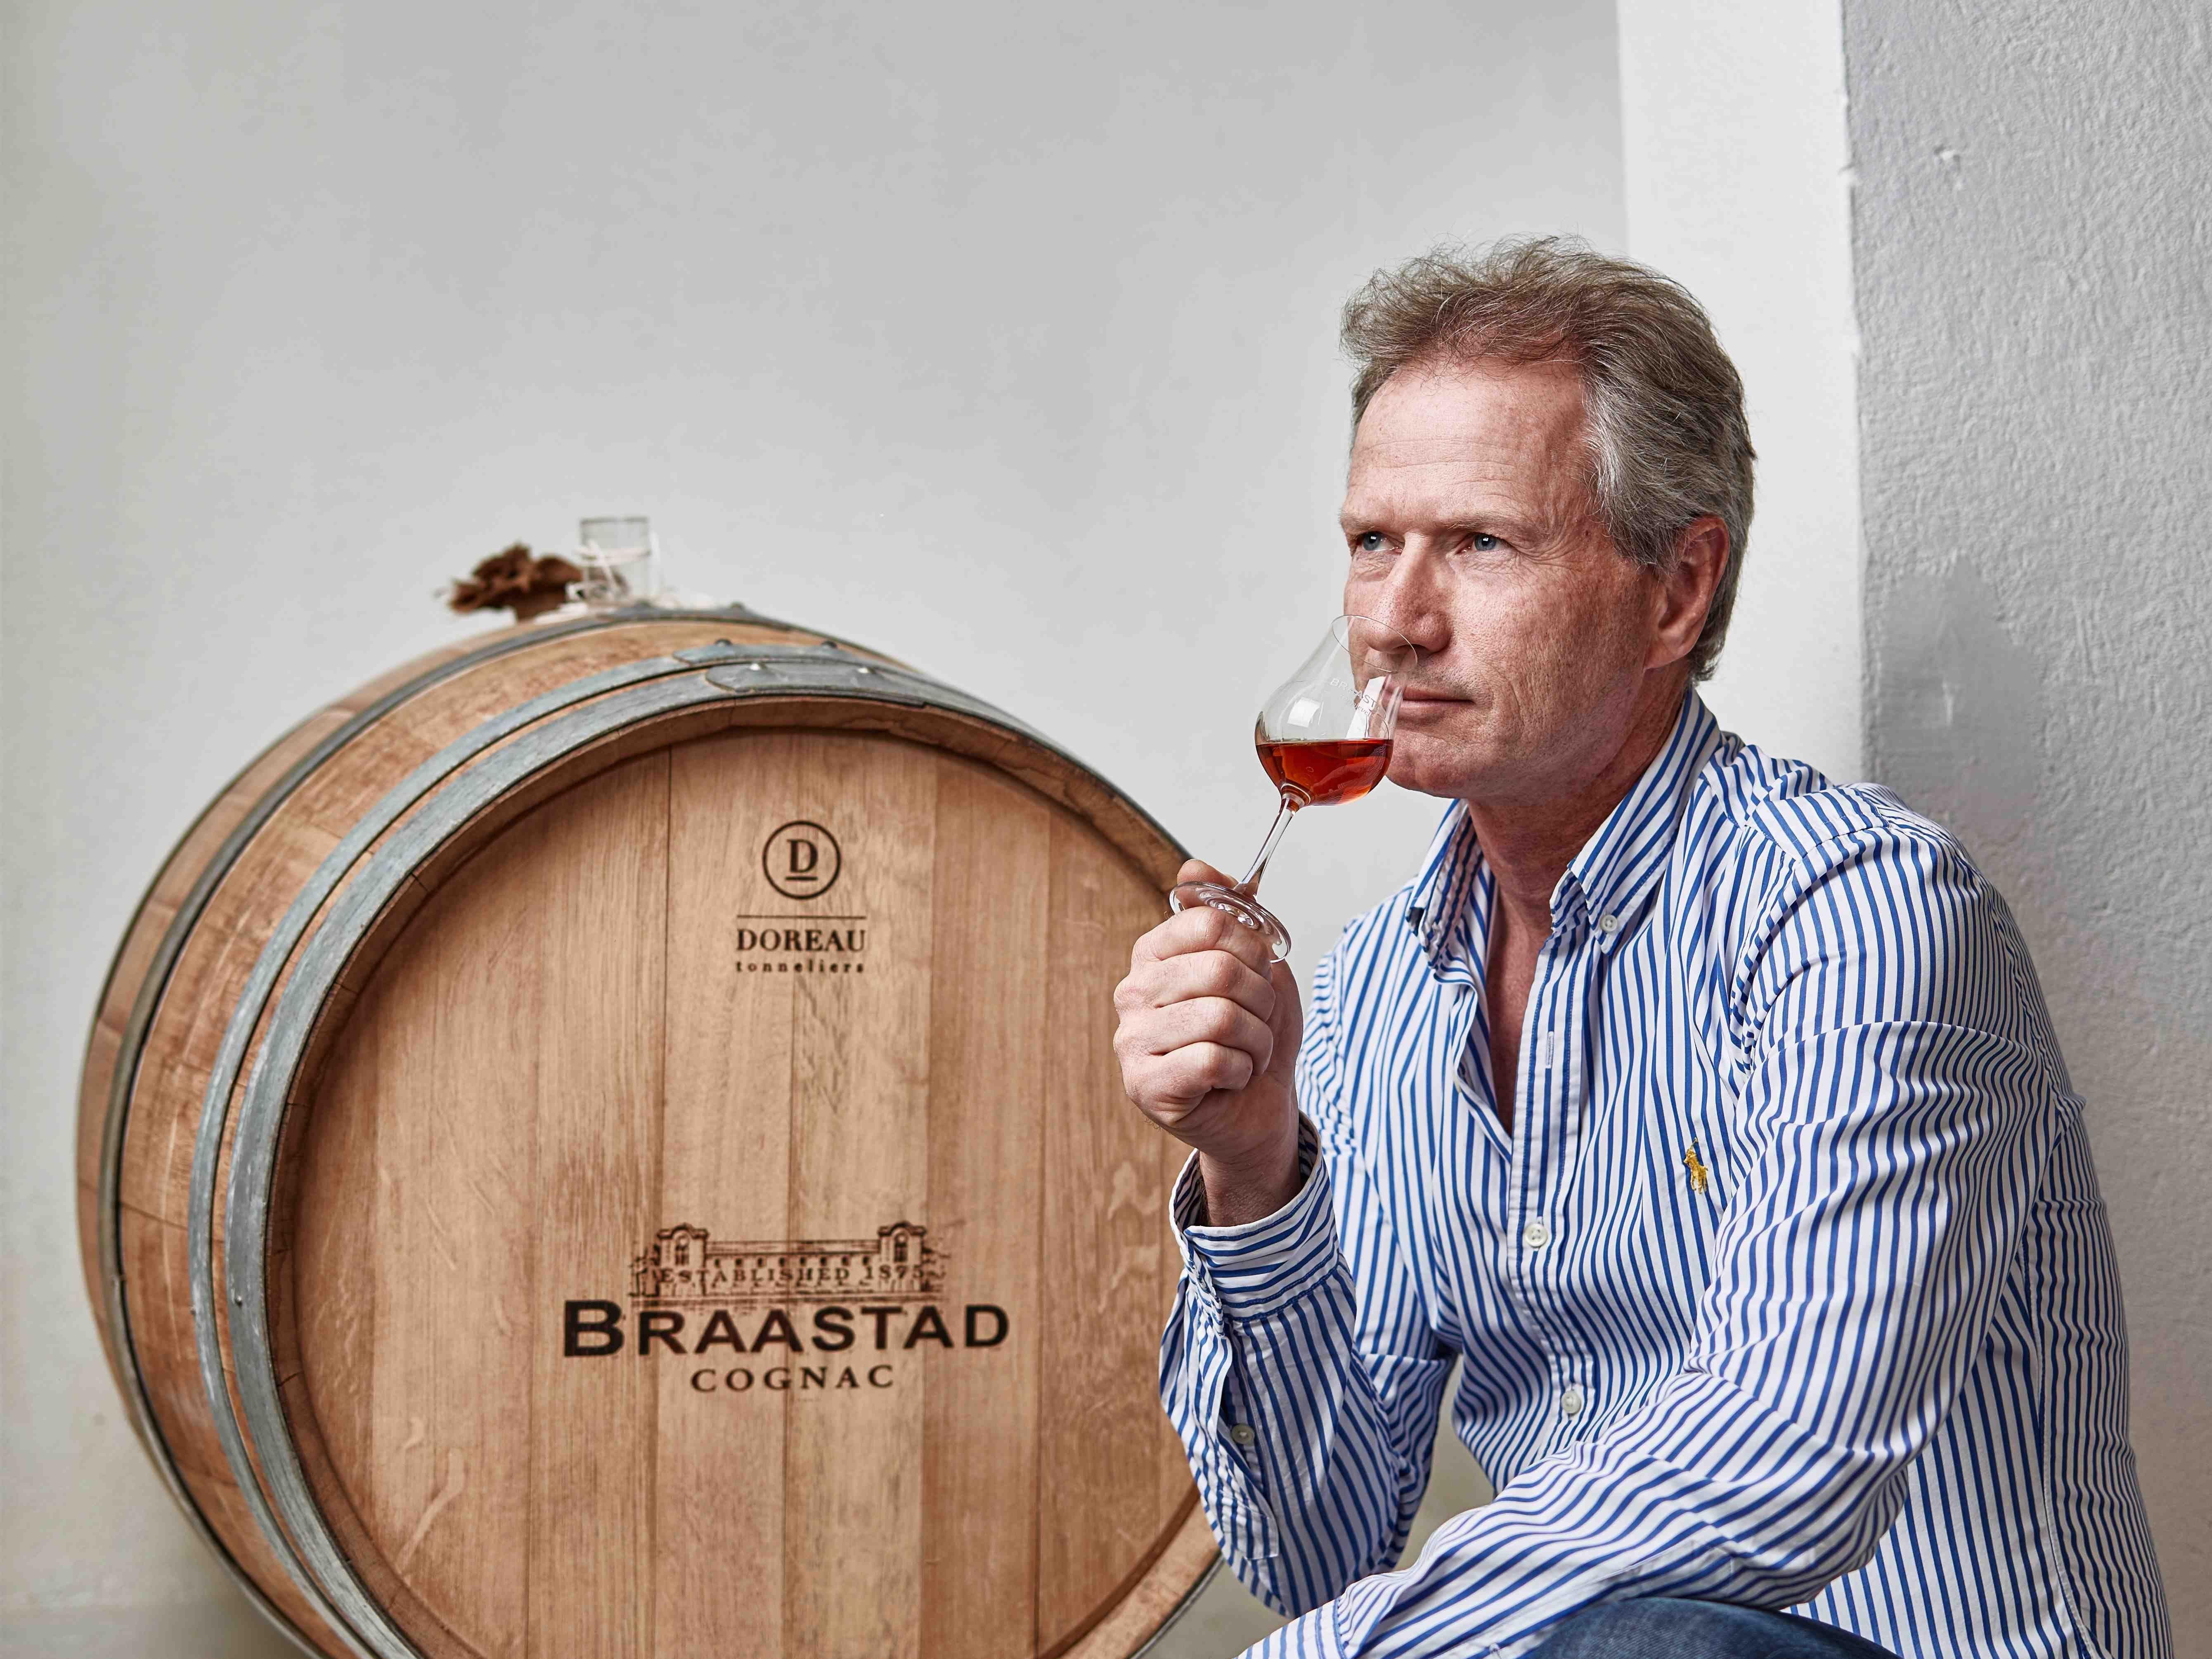 Cognac-smaking med Patrick Braastad!